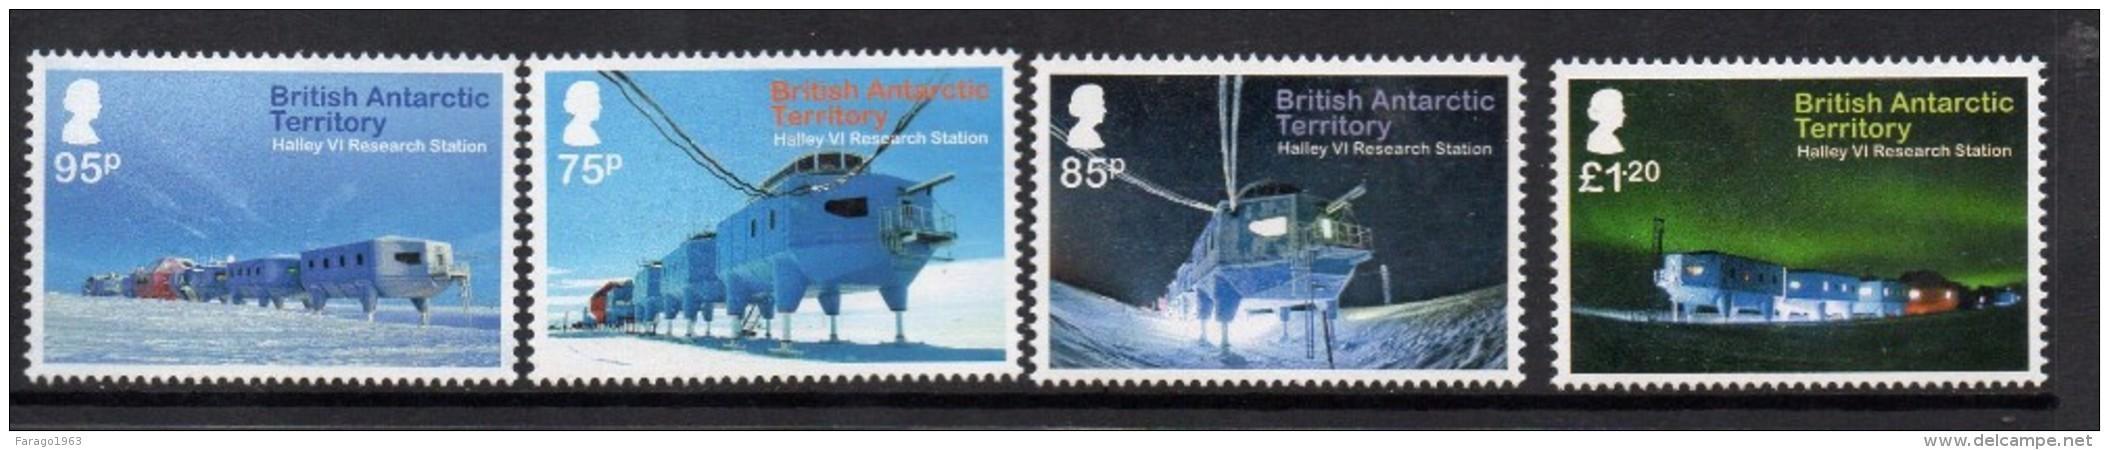 2013 British Antarctic Territory Halley Station Complete Set Of 4 MNH - Britisches Antarktis-Territorium  (BAT)